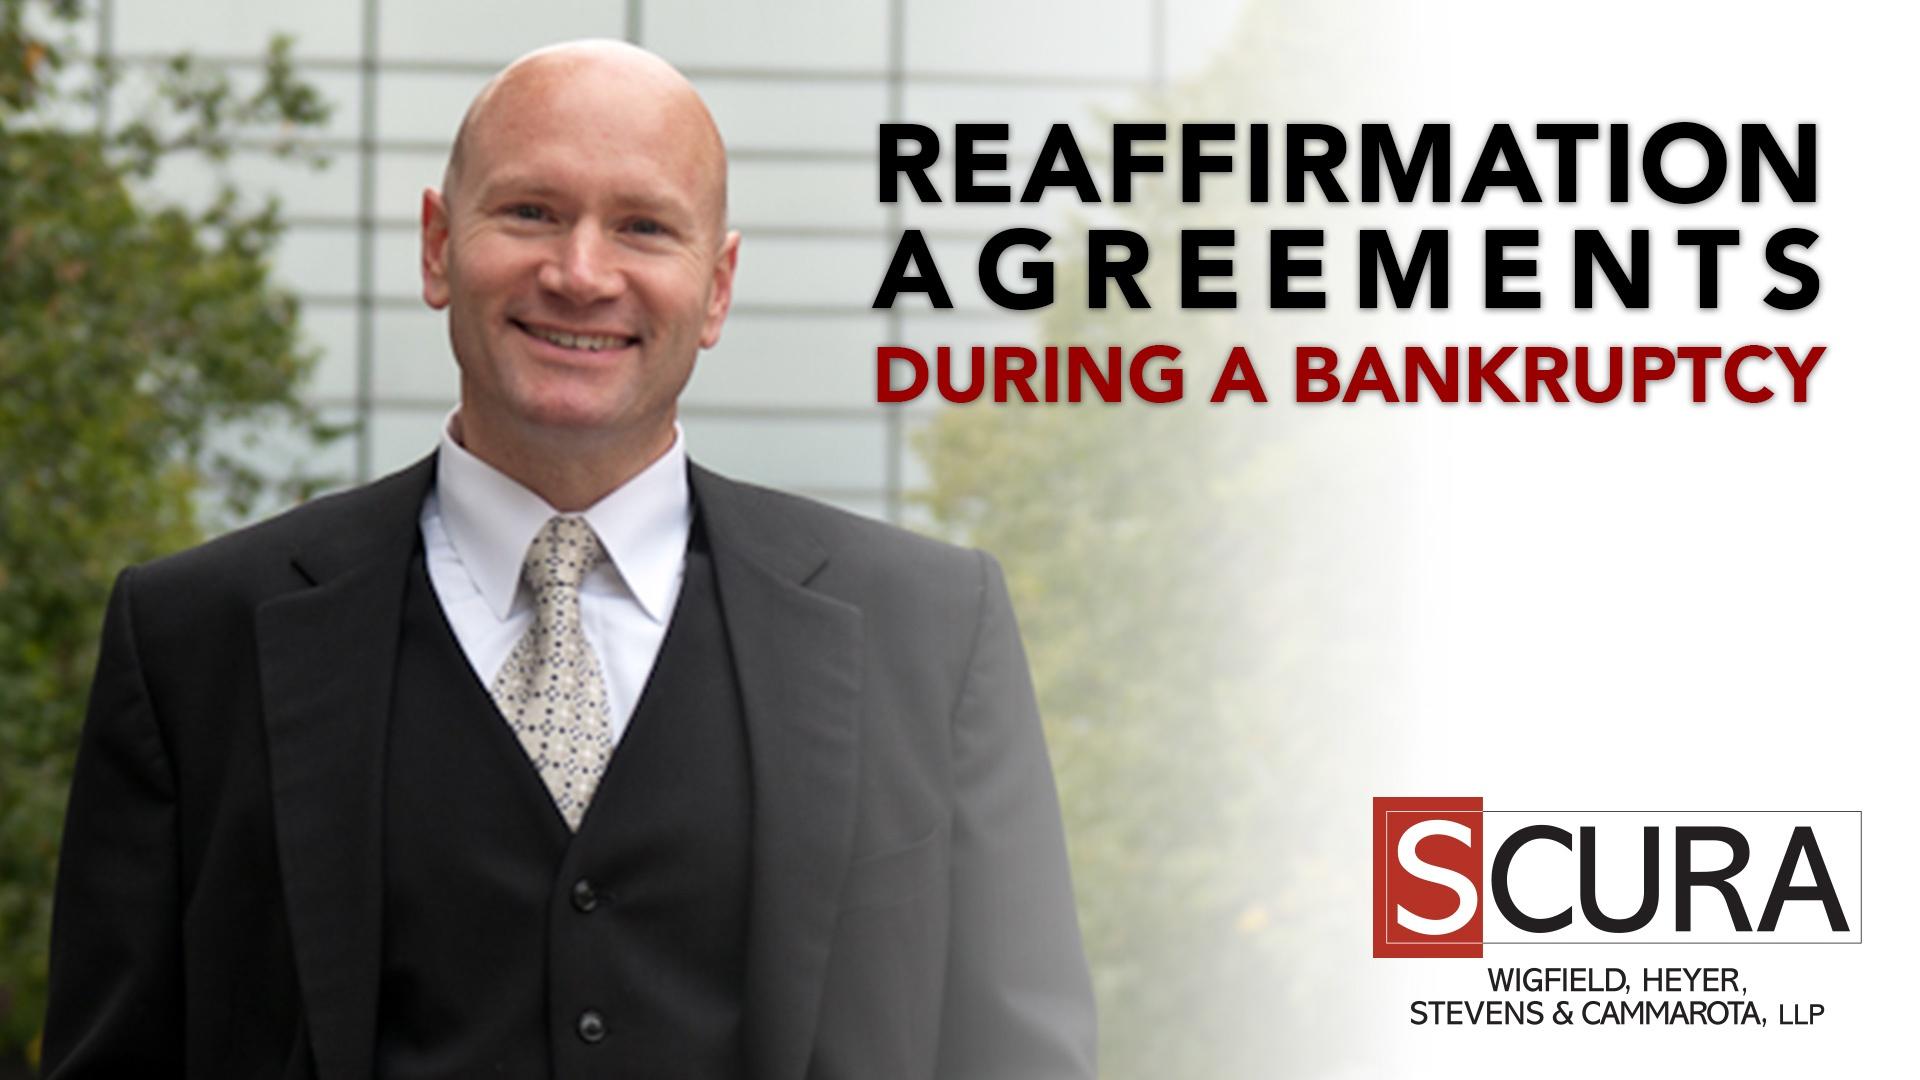 reaffirmation-agreements-bankruptcy-thumbnail